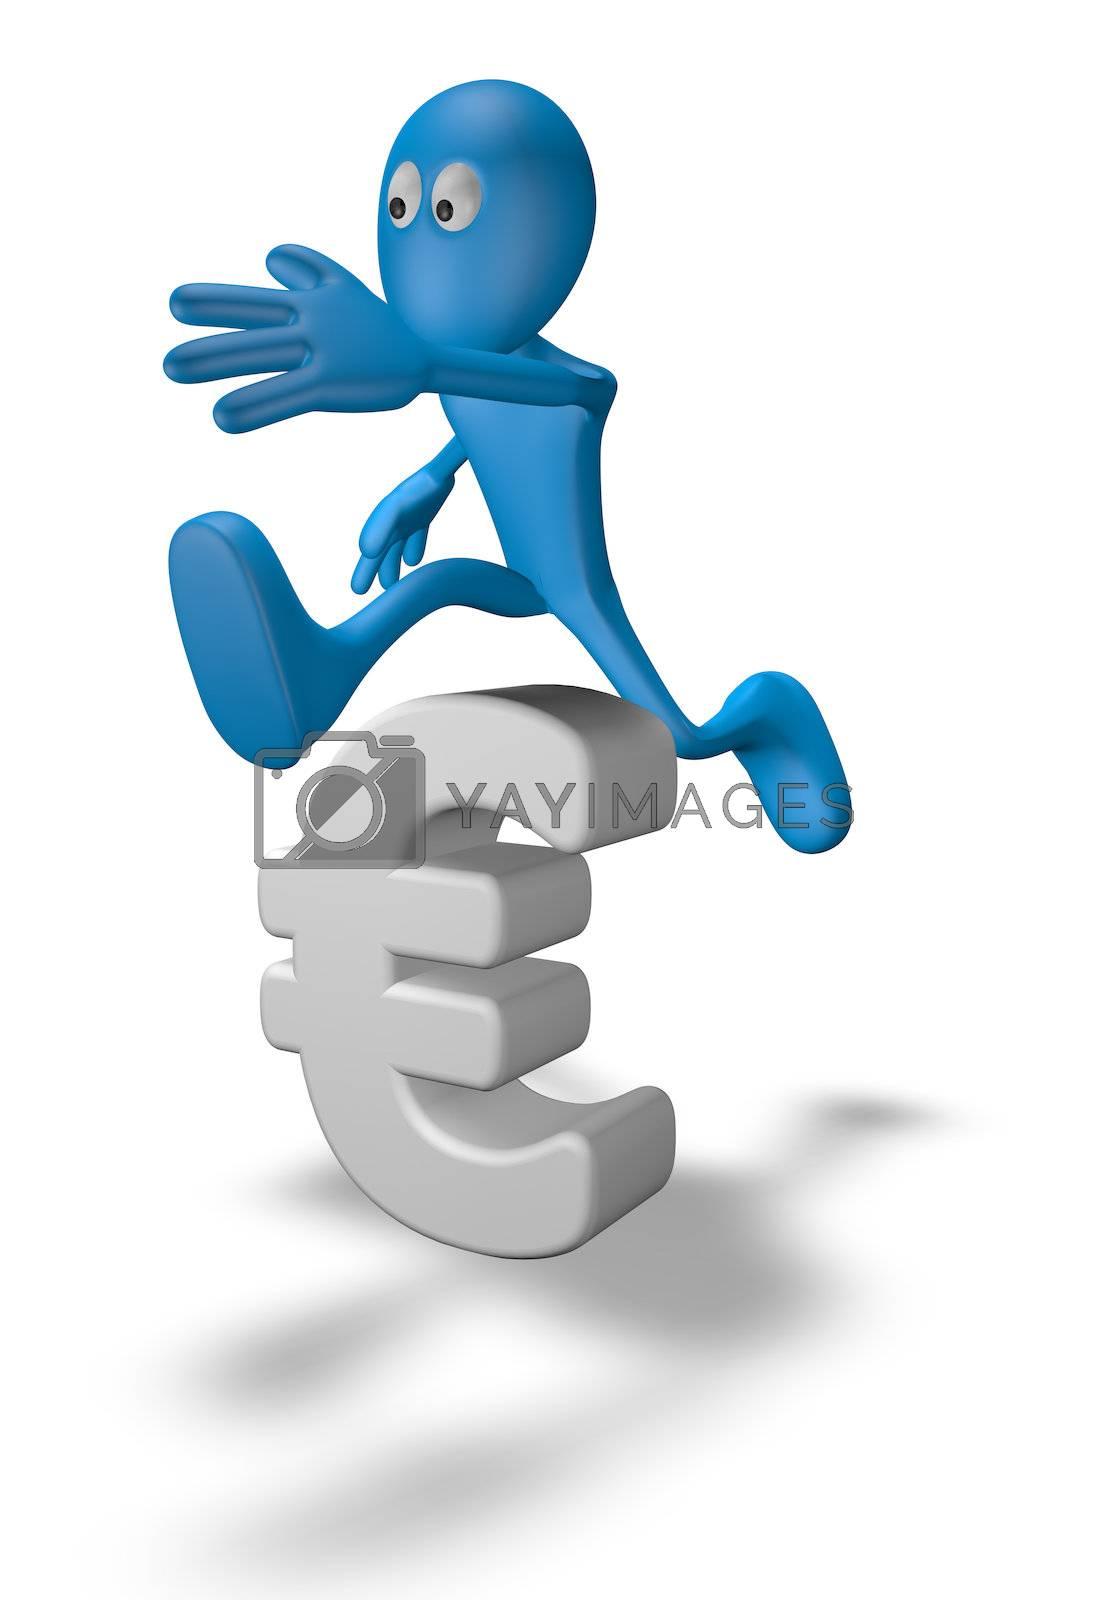 cartoon guy jumps over euro symbol - 3d illustration